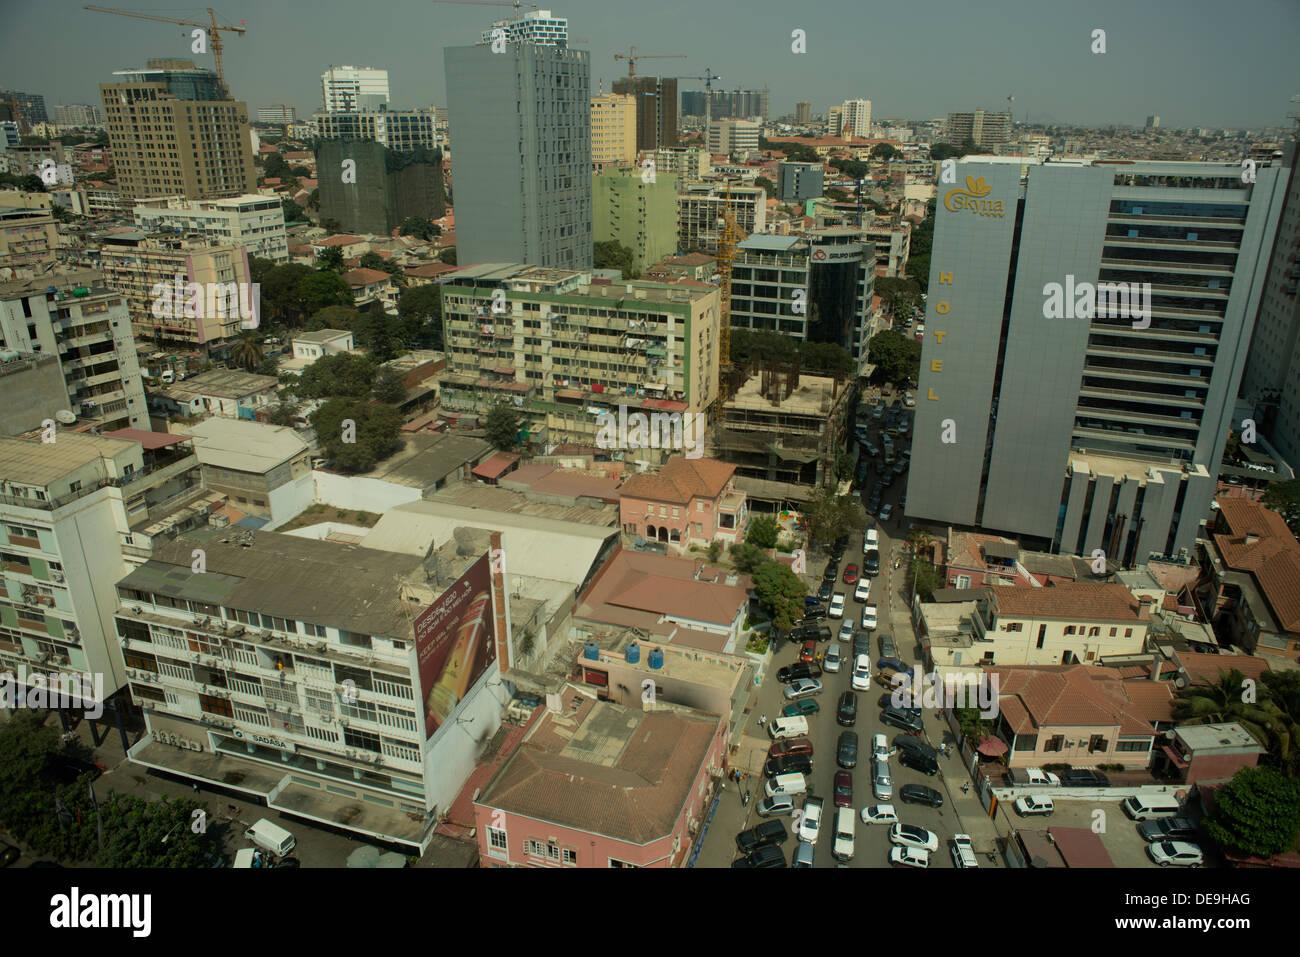 Luanda, Angola, showing new hotels and slum buildings Stock Photo